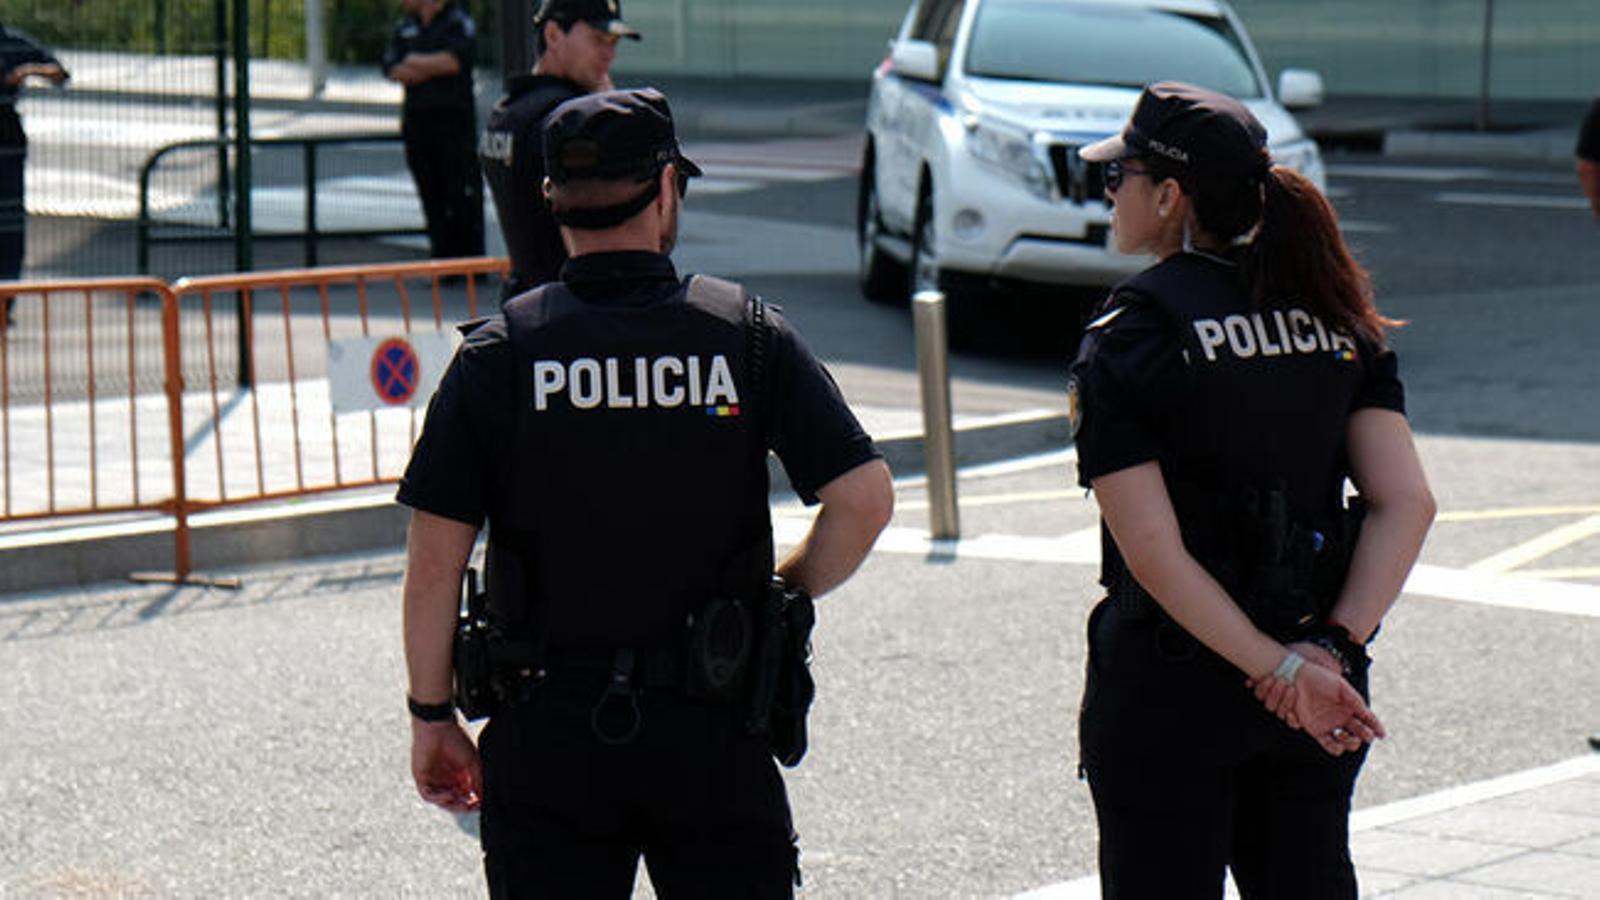 Dos agents de policia en una imatge d'arxiu. / Arxiu ANA